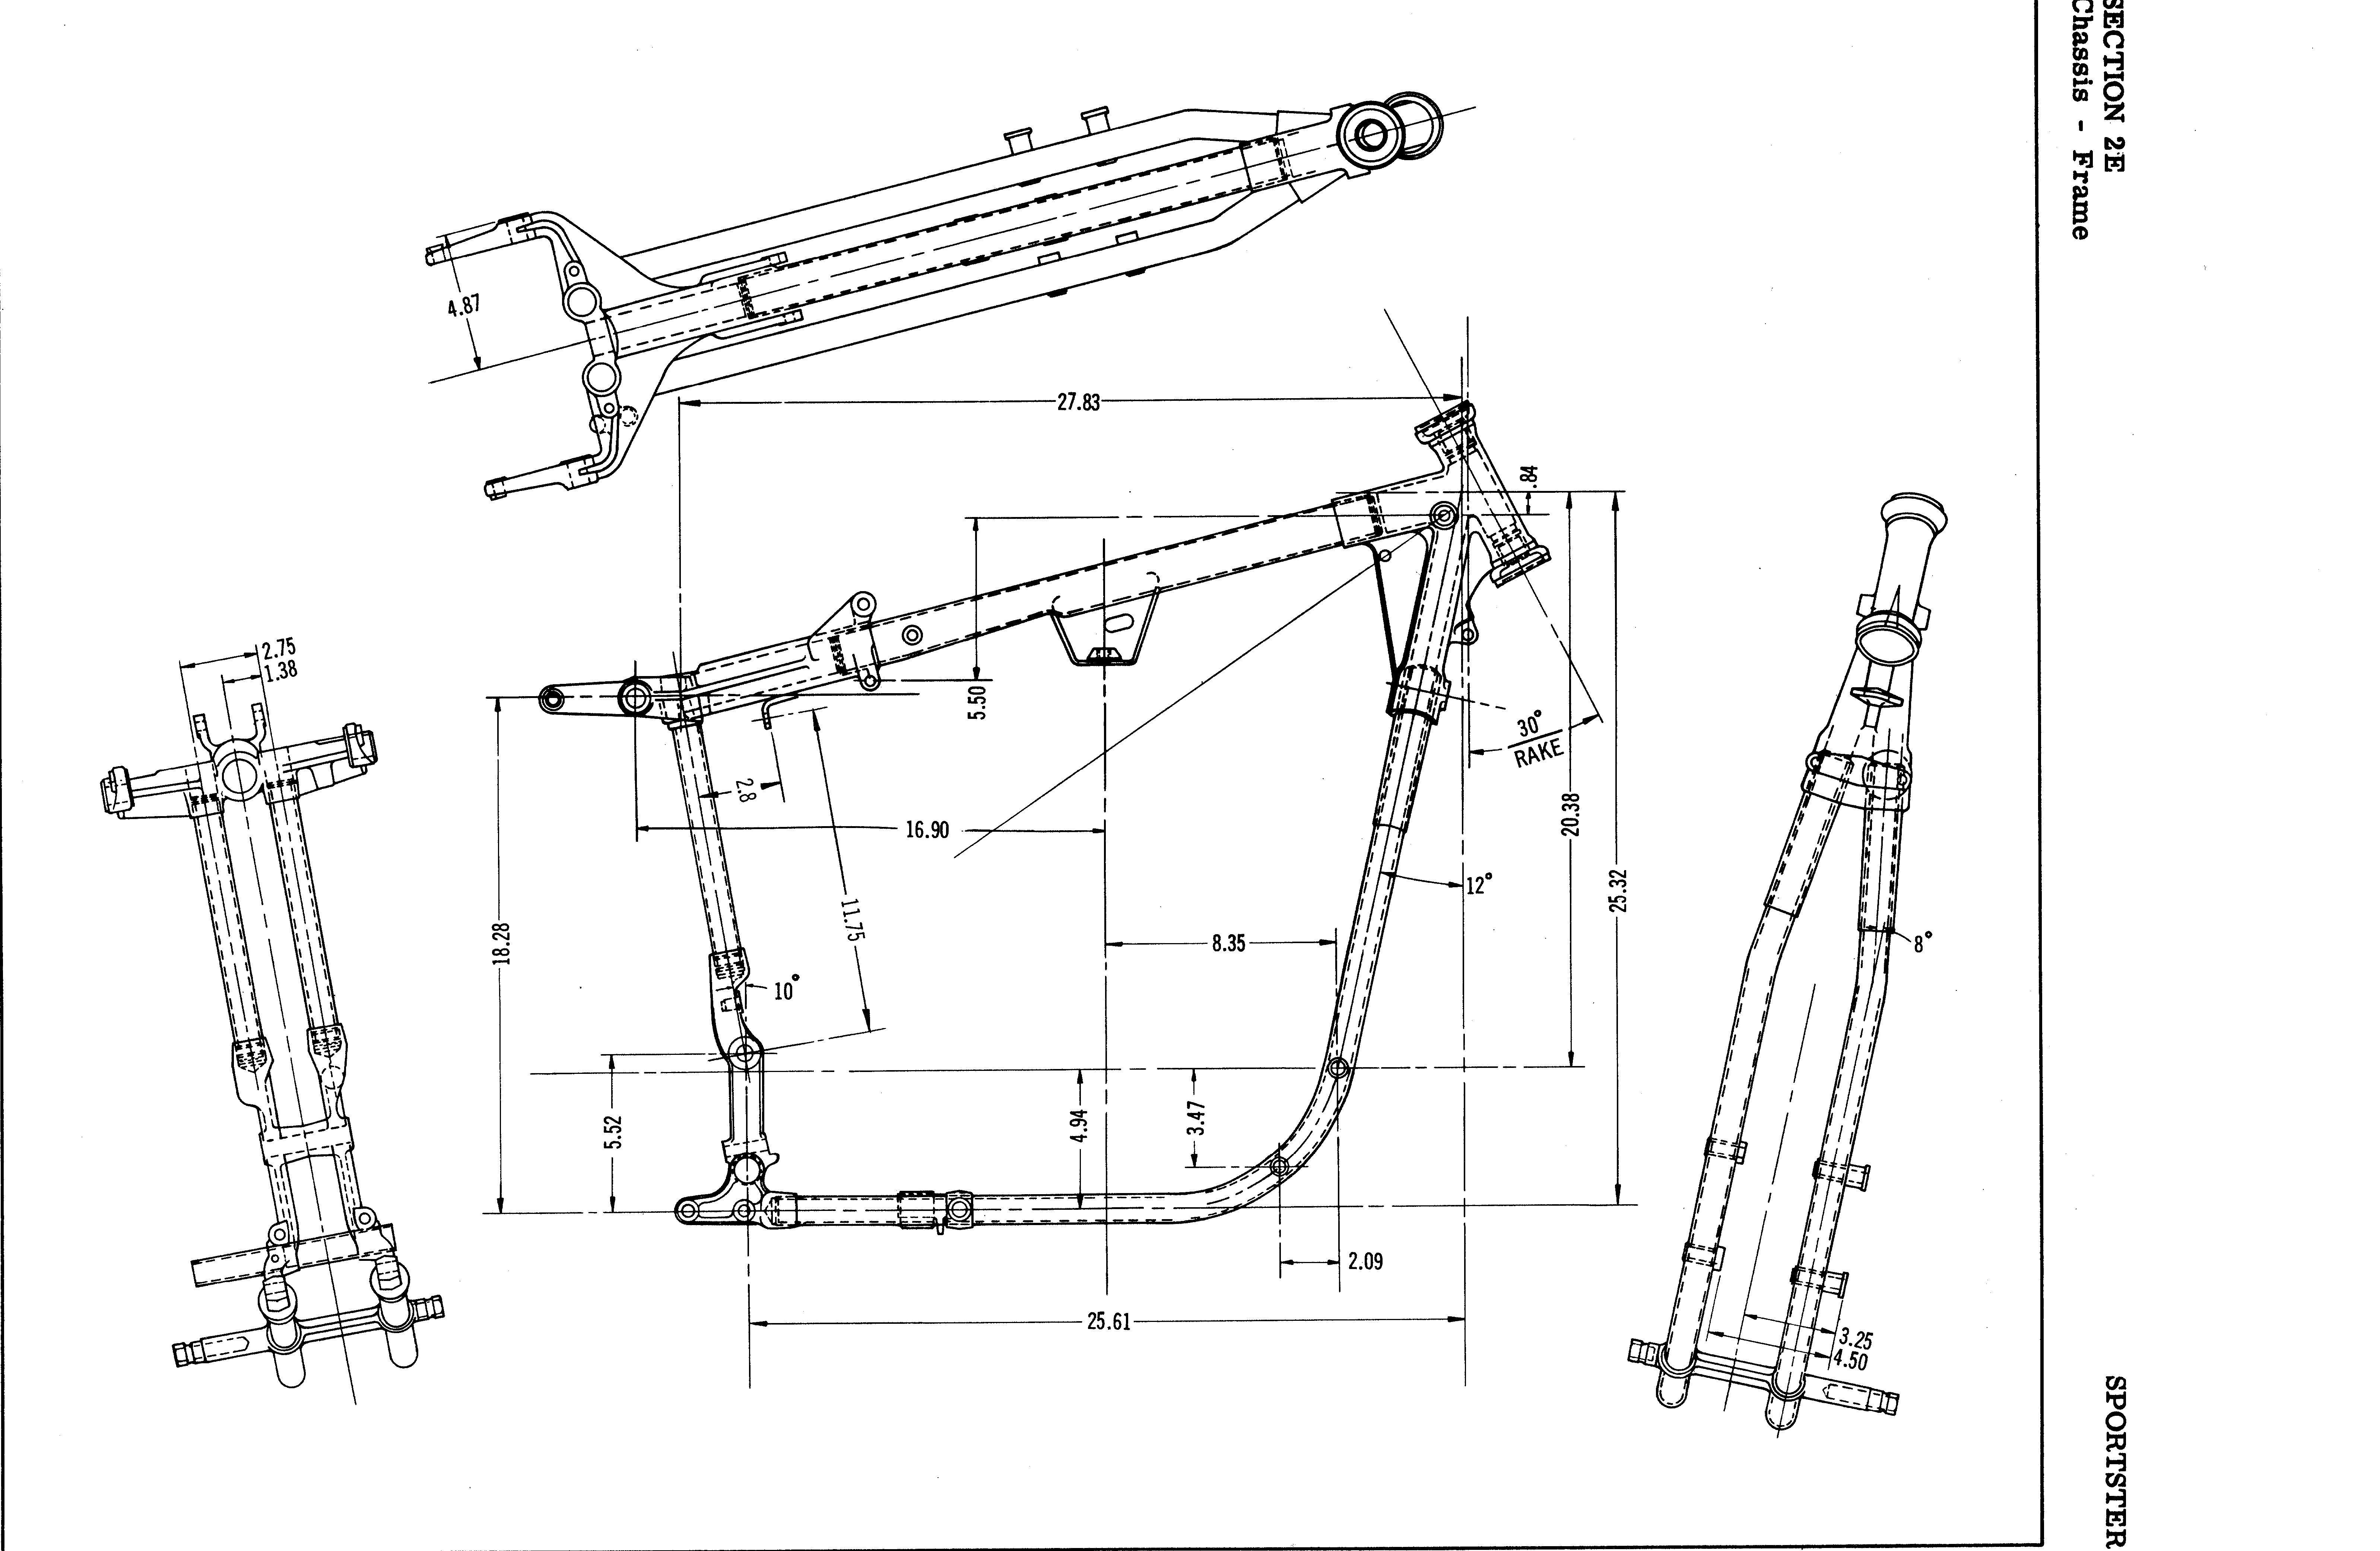 harley softail frame diagram shark skeleton ironhead motorcycle engines and blueprints pinterest exploded view iron 883 engine bobber davidson